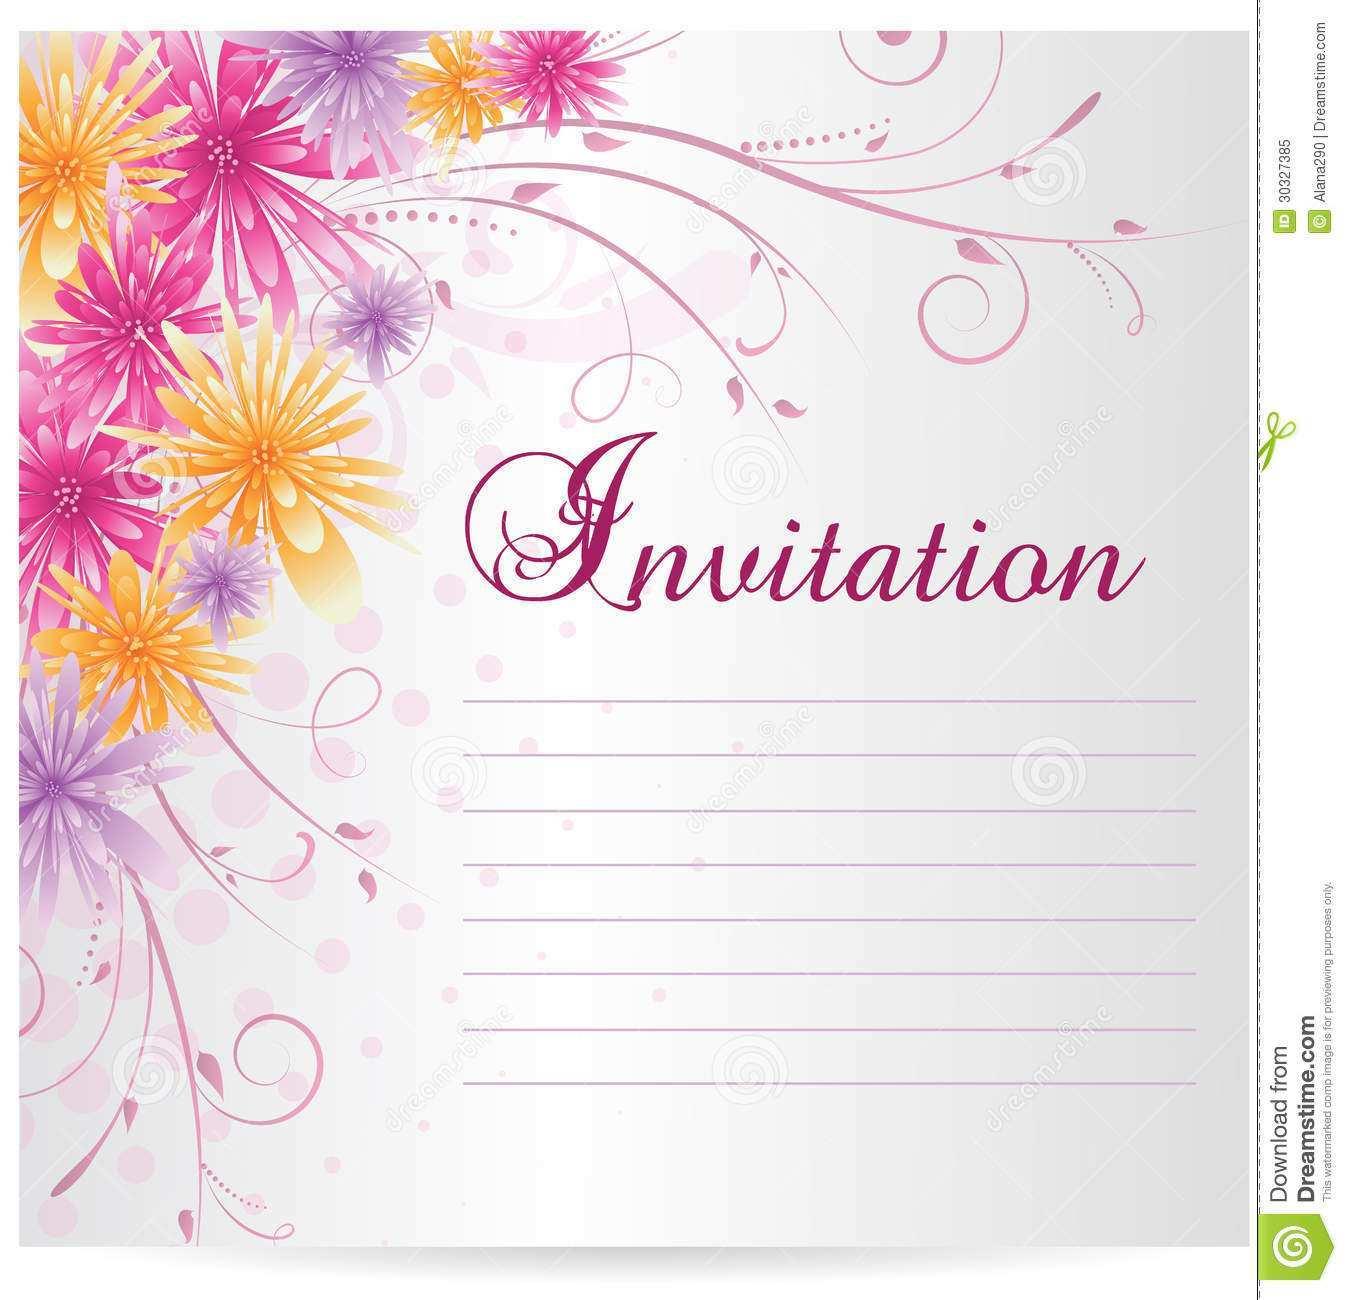 33 Customize Blank Birthday Invitation Templates For Microsoft Word Now for Blank Birthday Invitation Templates For Microsoft Word